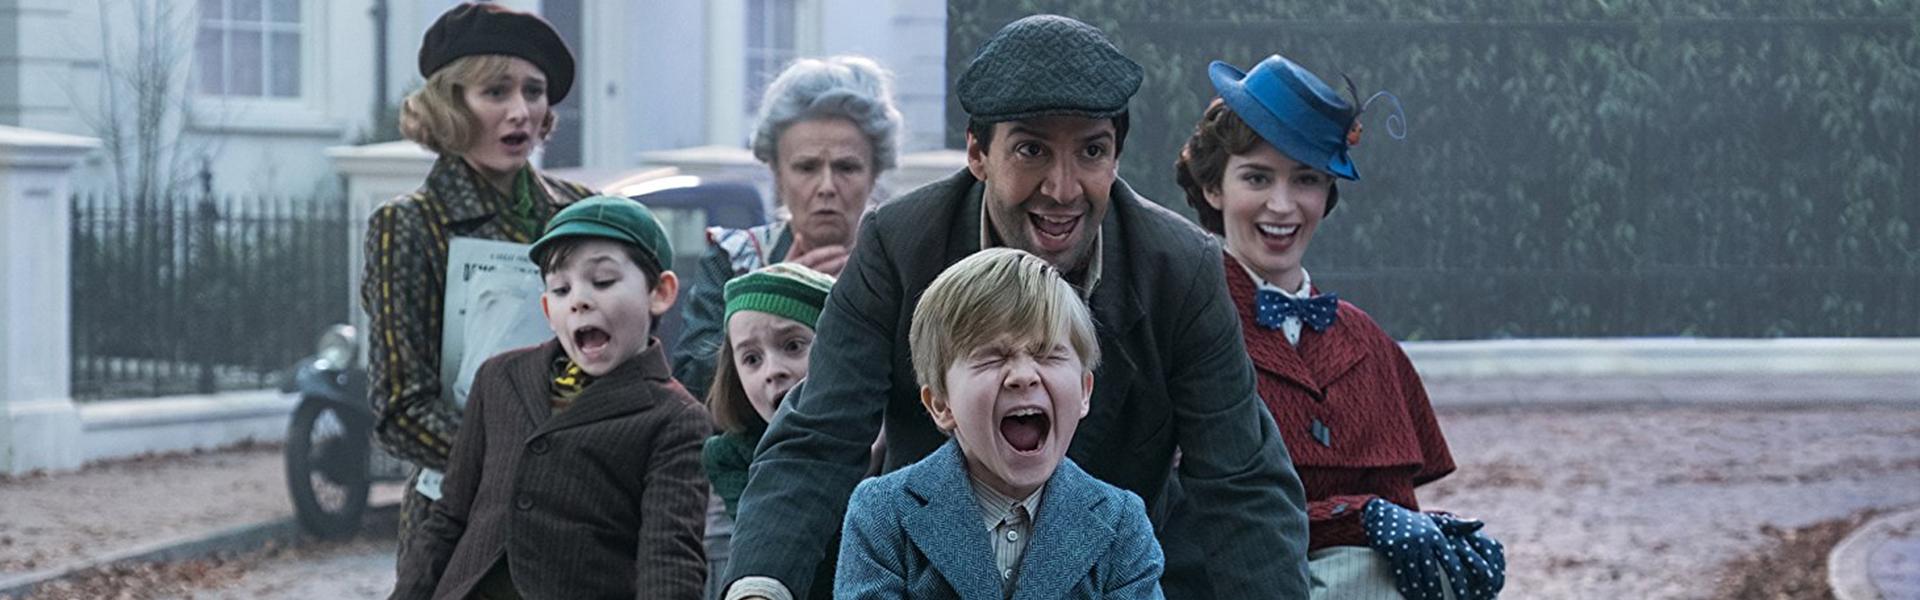 Mary Poppins powraca <span>(dubbing)</span>